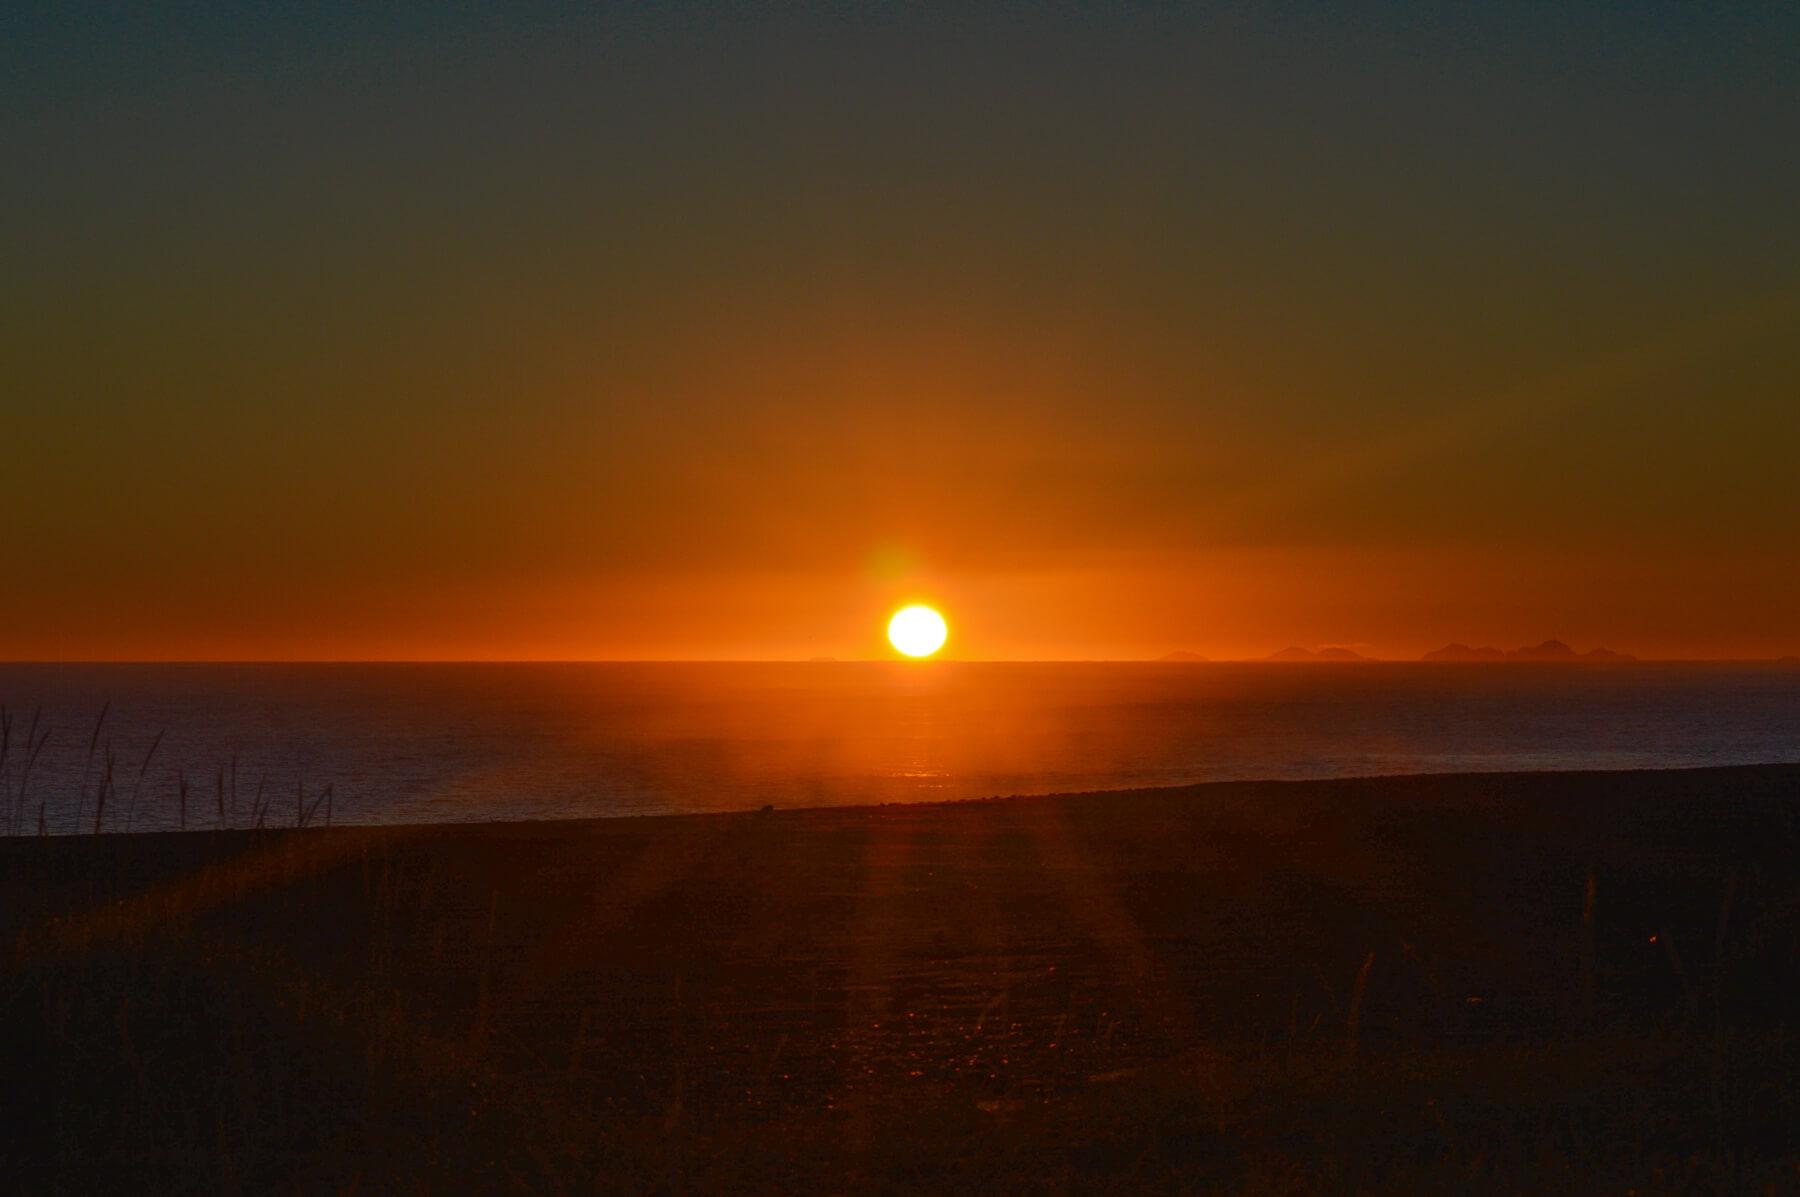 Orange sun shining over the horizon - behind the beach